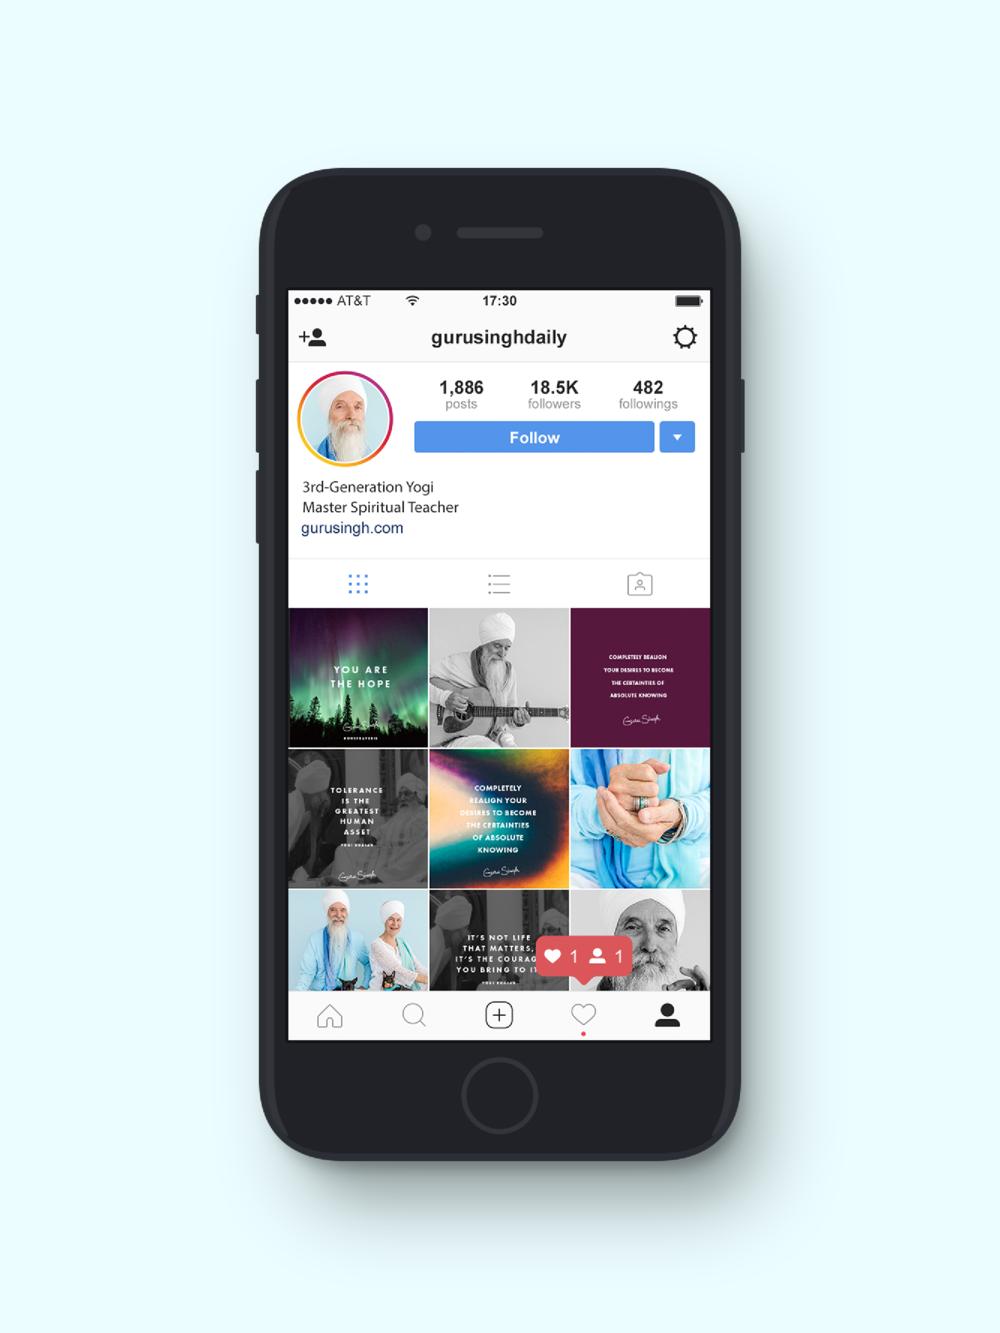 Guru Singh Social Media + Graphic Design | Trout + Taylor www.troutandtaylor.com